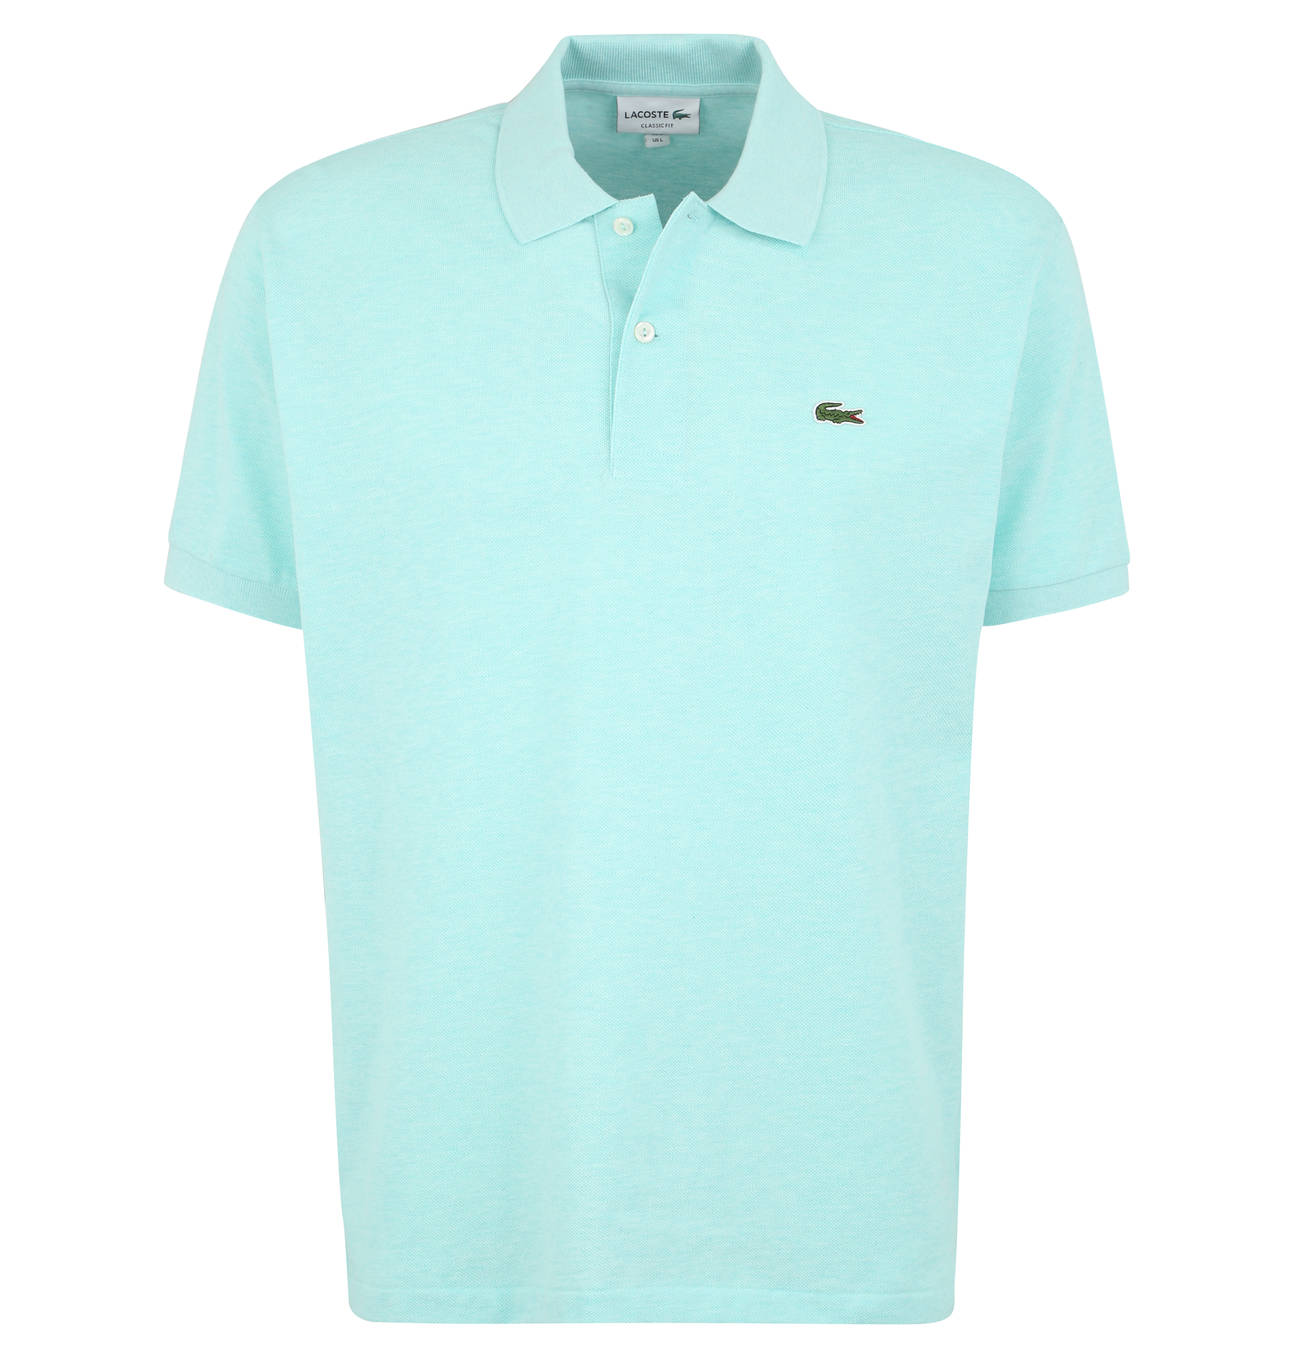 big sale ec9b3 6f517 Polo-Shirt, Classic Fit, Piqué, Logo-Stickerei, unifarben ...